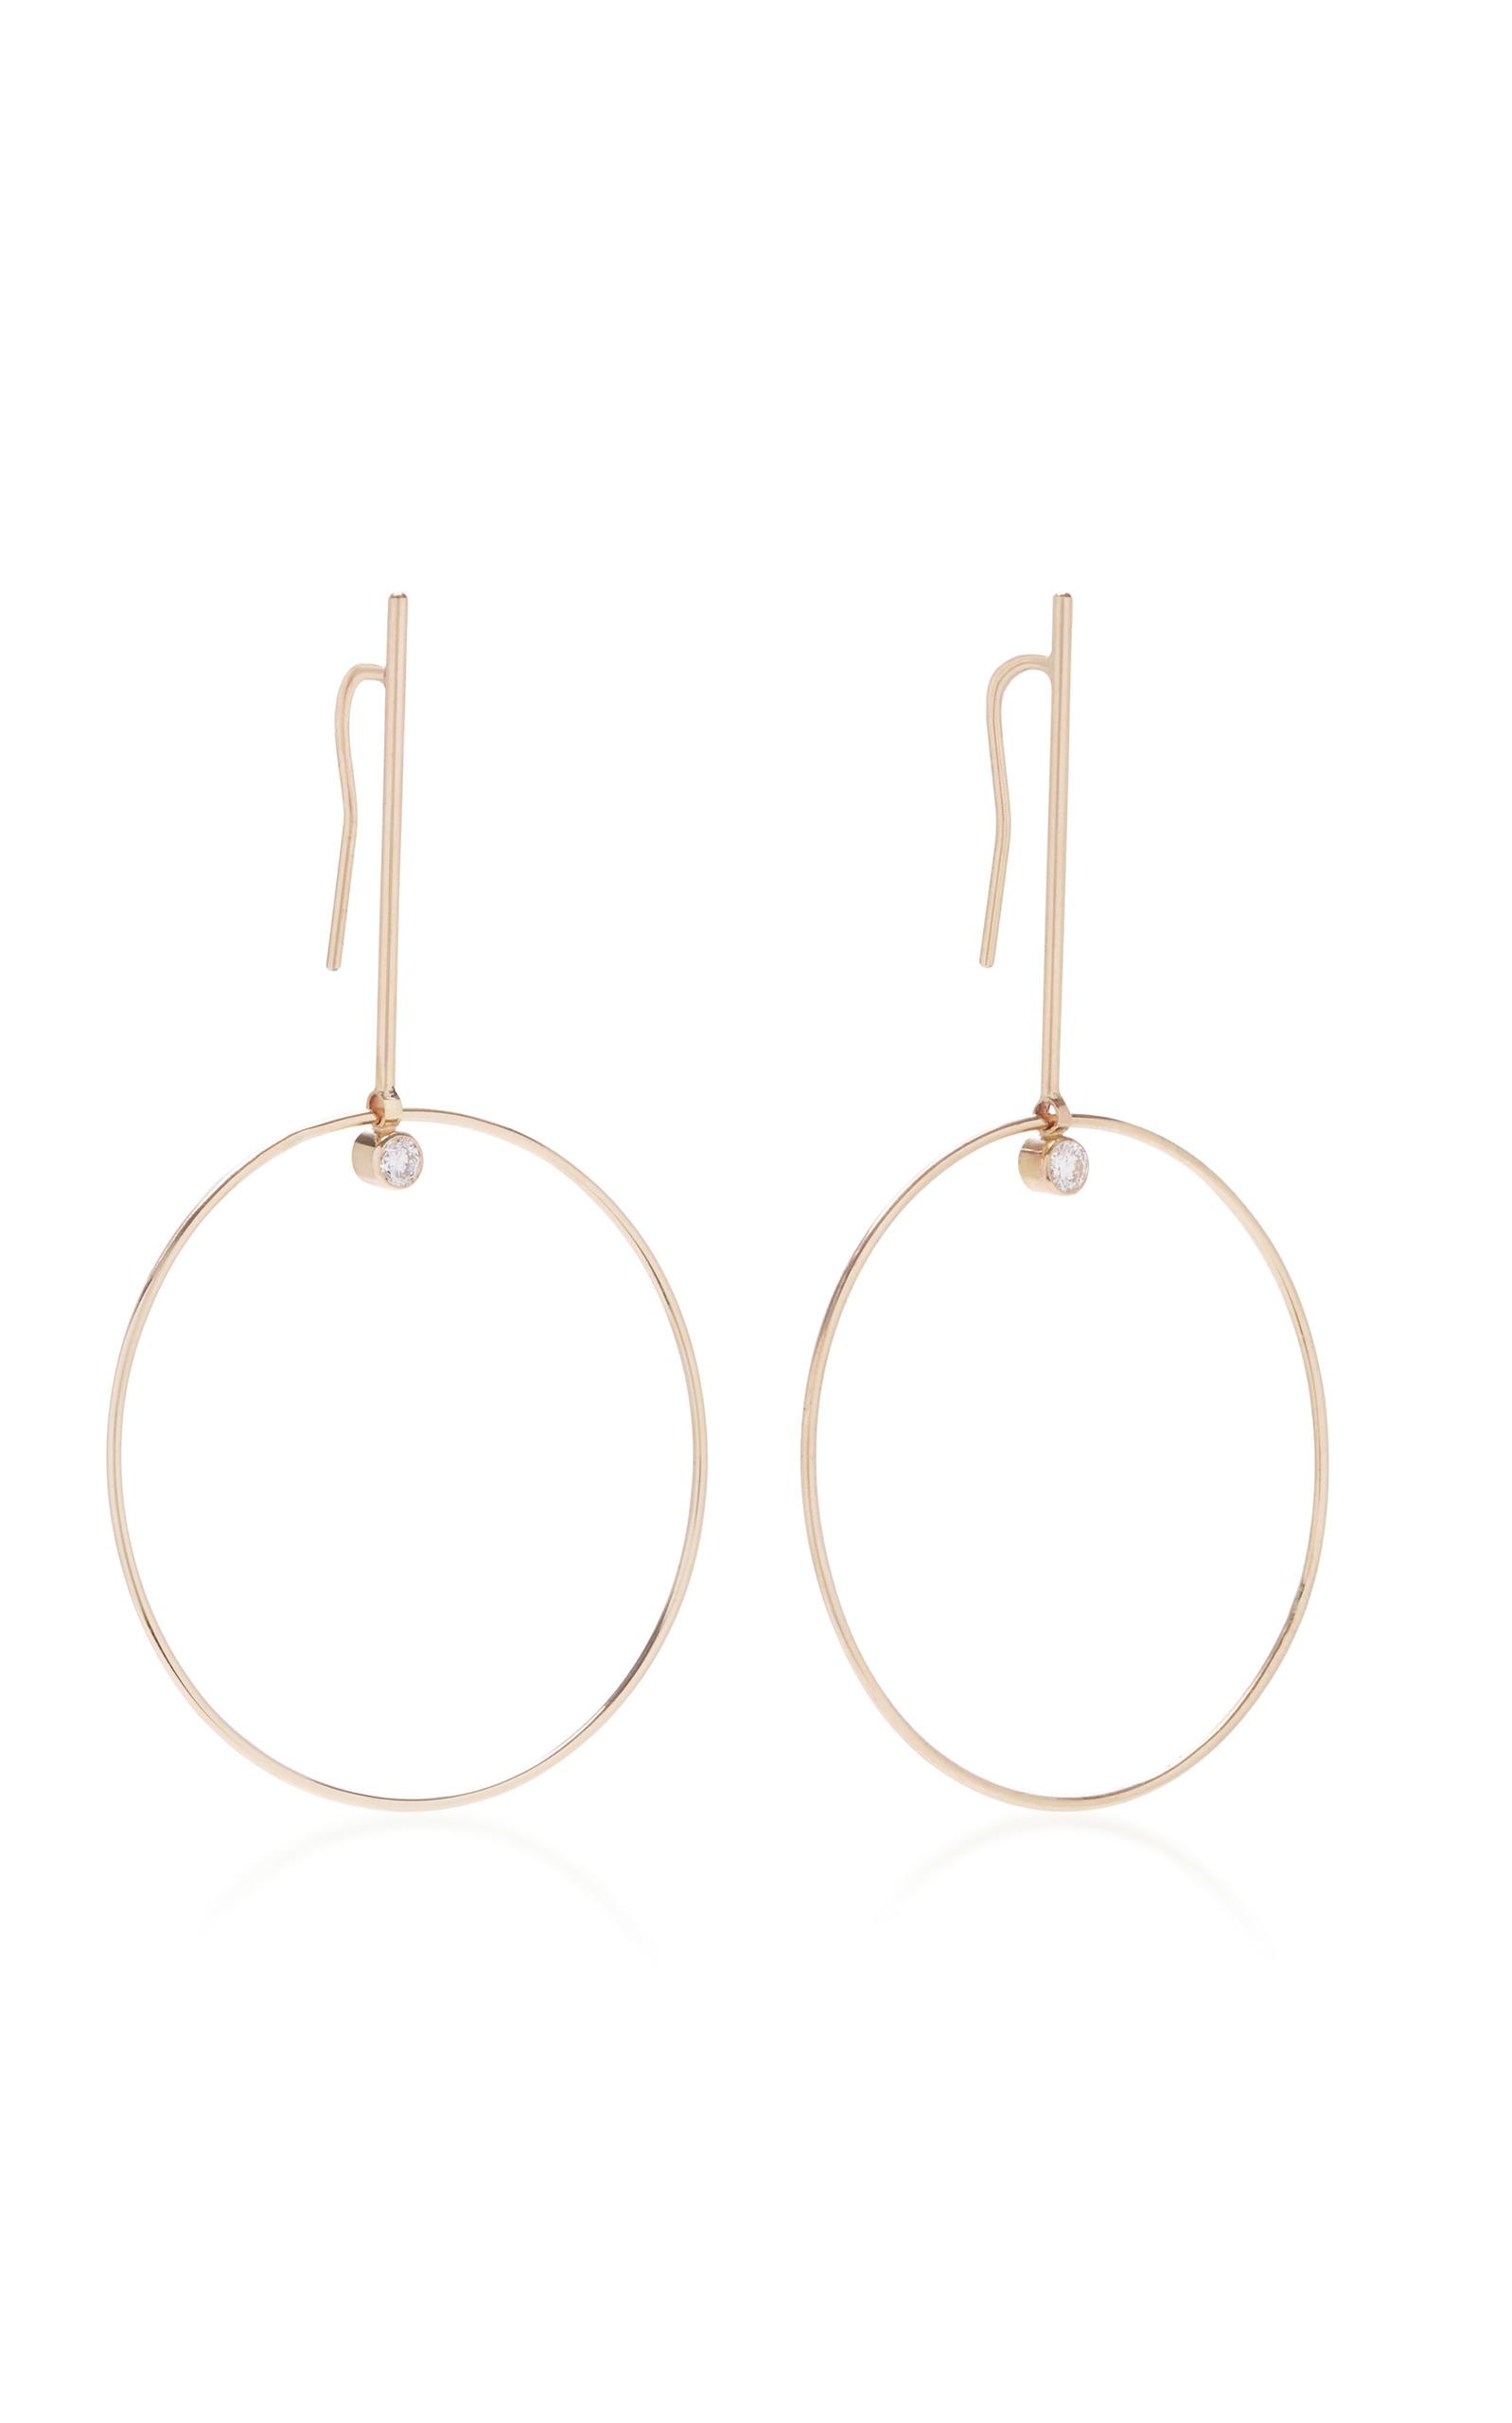 Sezio 14K Gold Diamond Earrings White/Space yqaeFbooxj